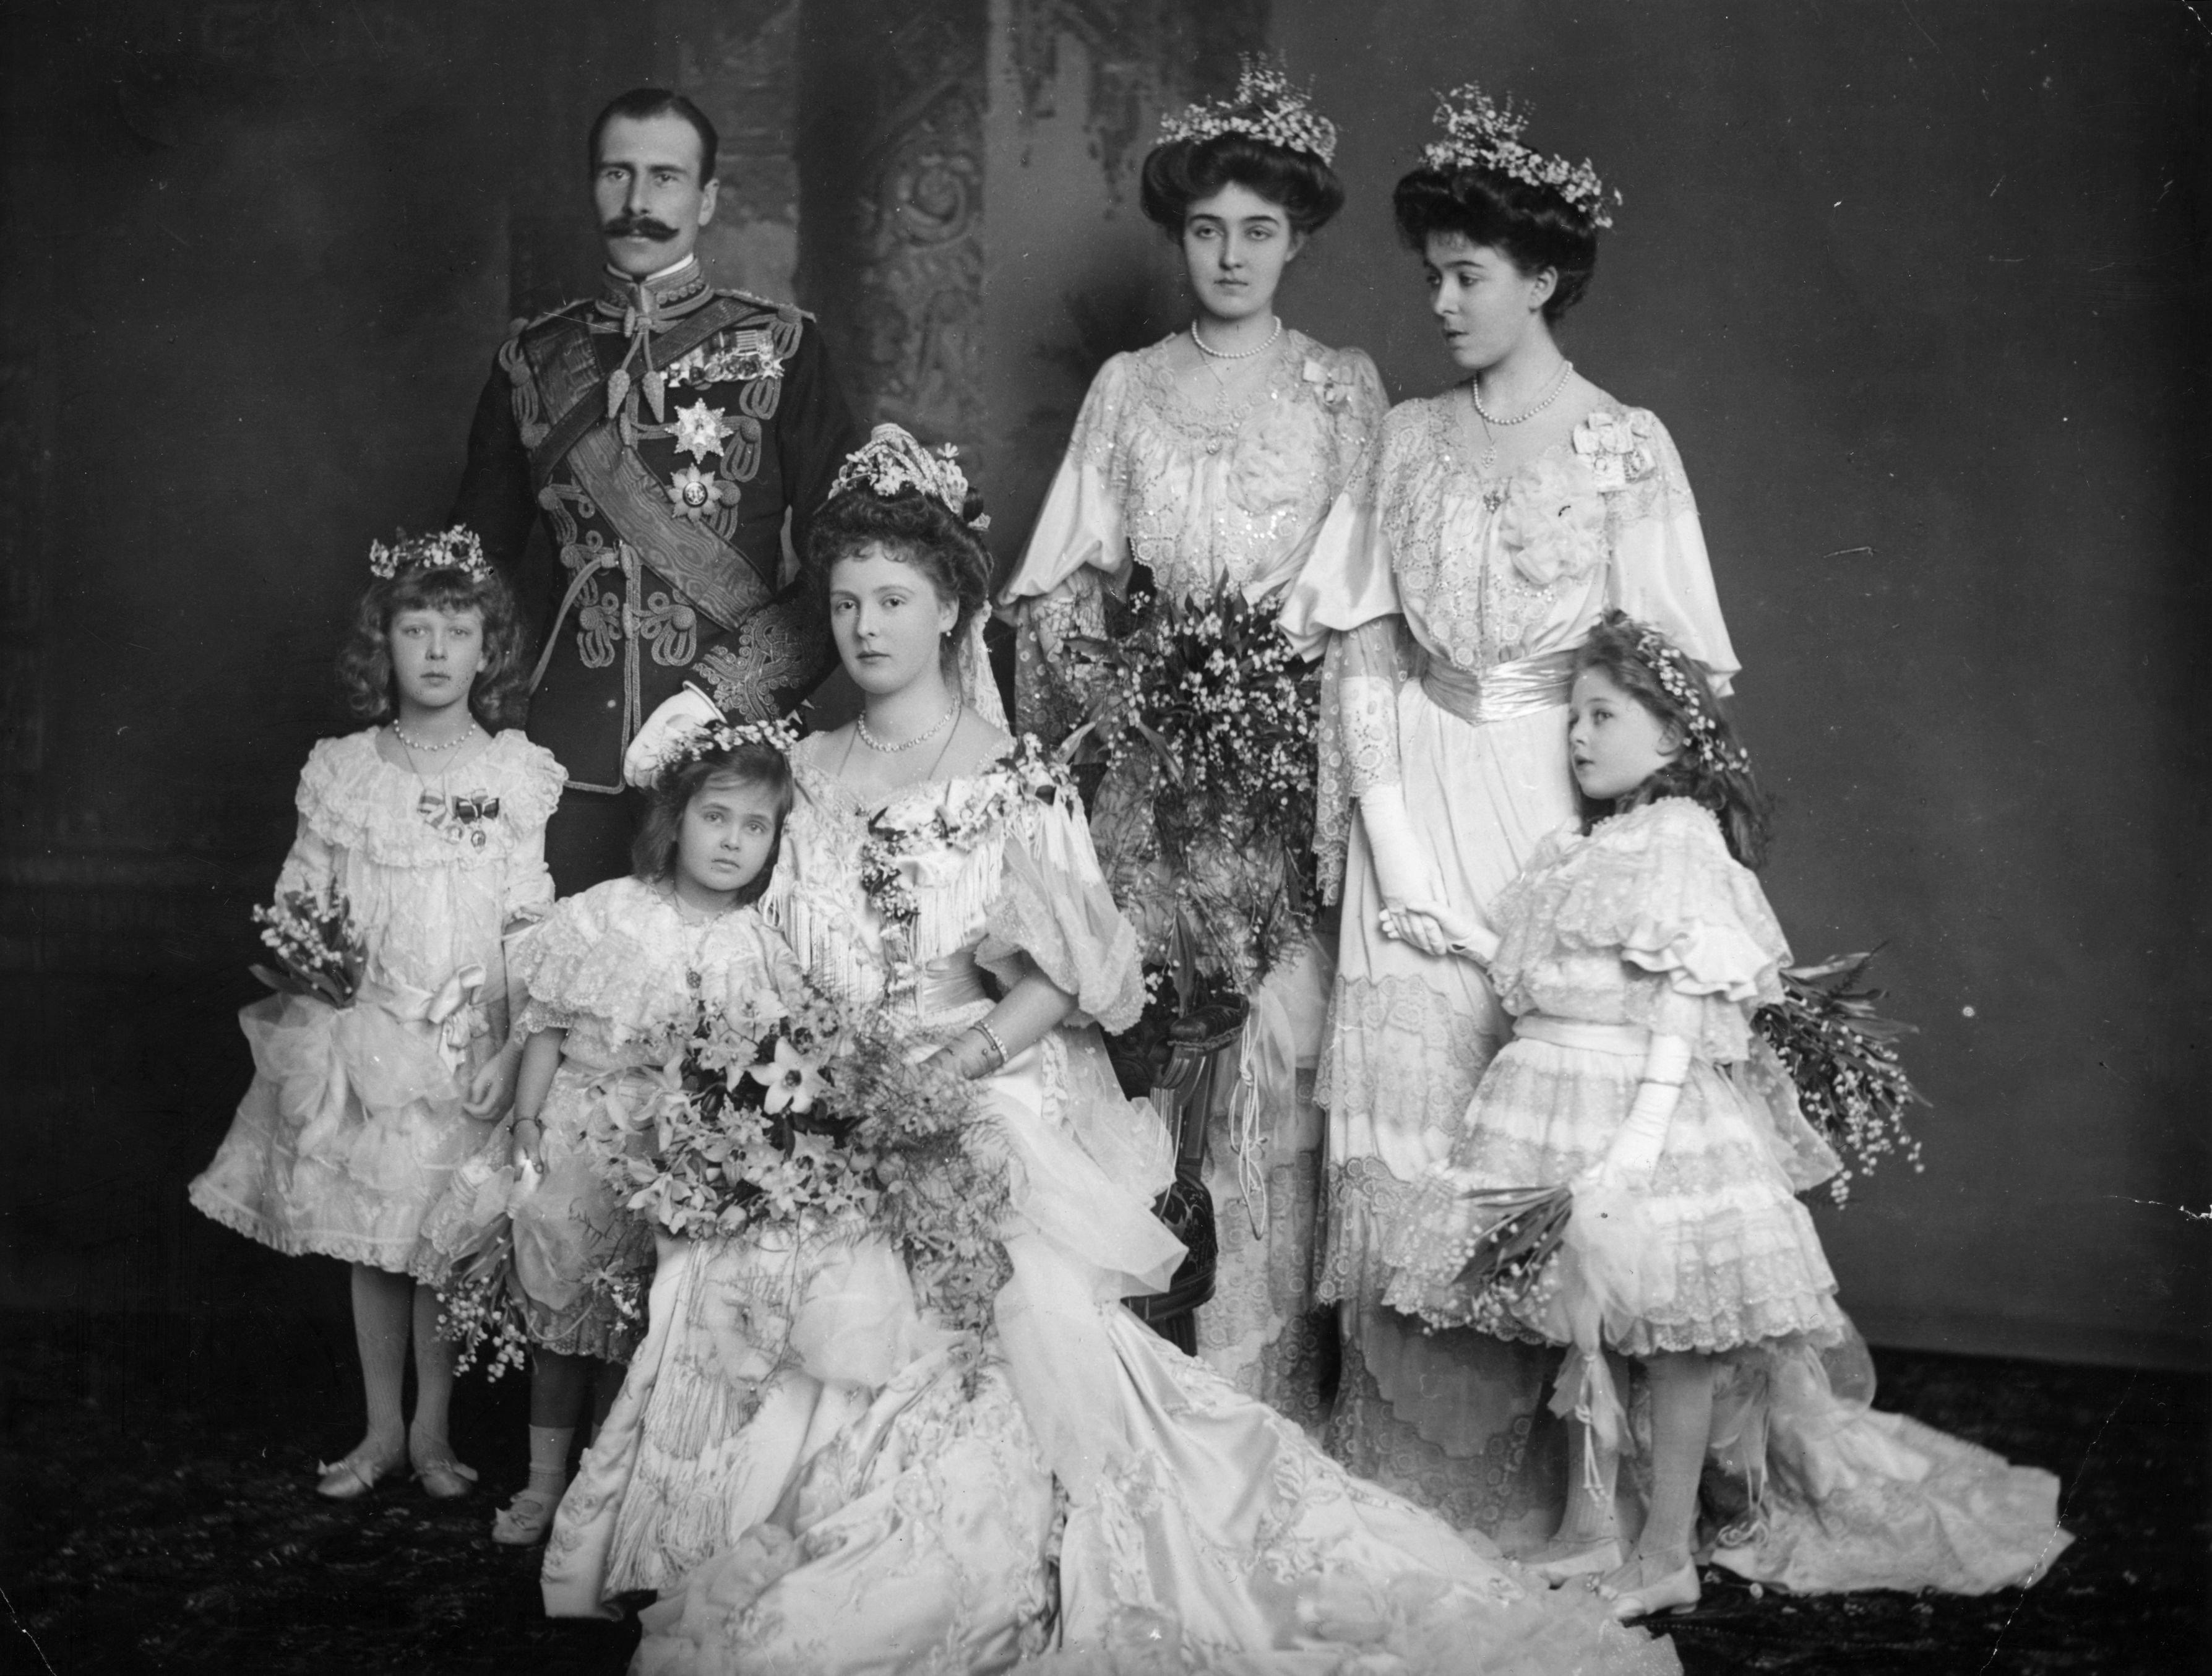 Princess Alice of Albany and Prince Alexander of Teck